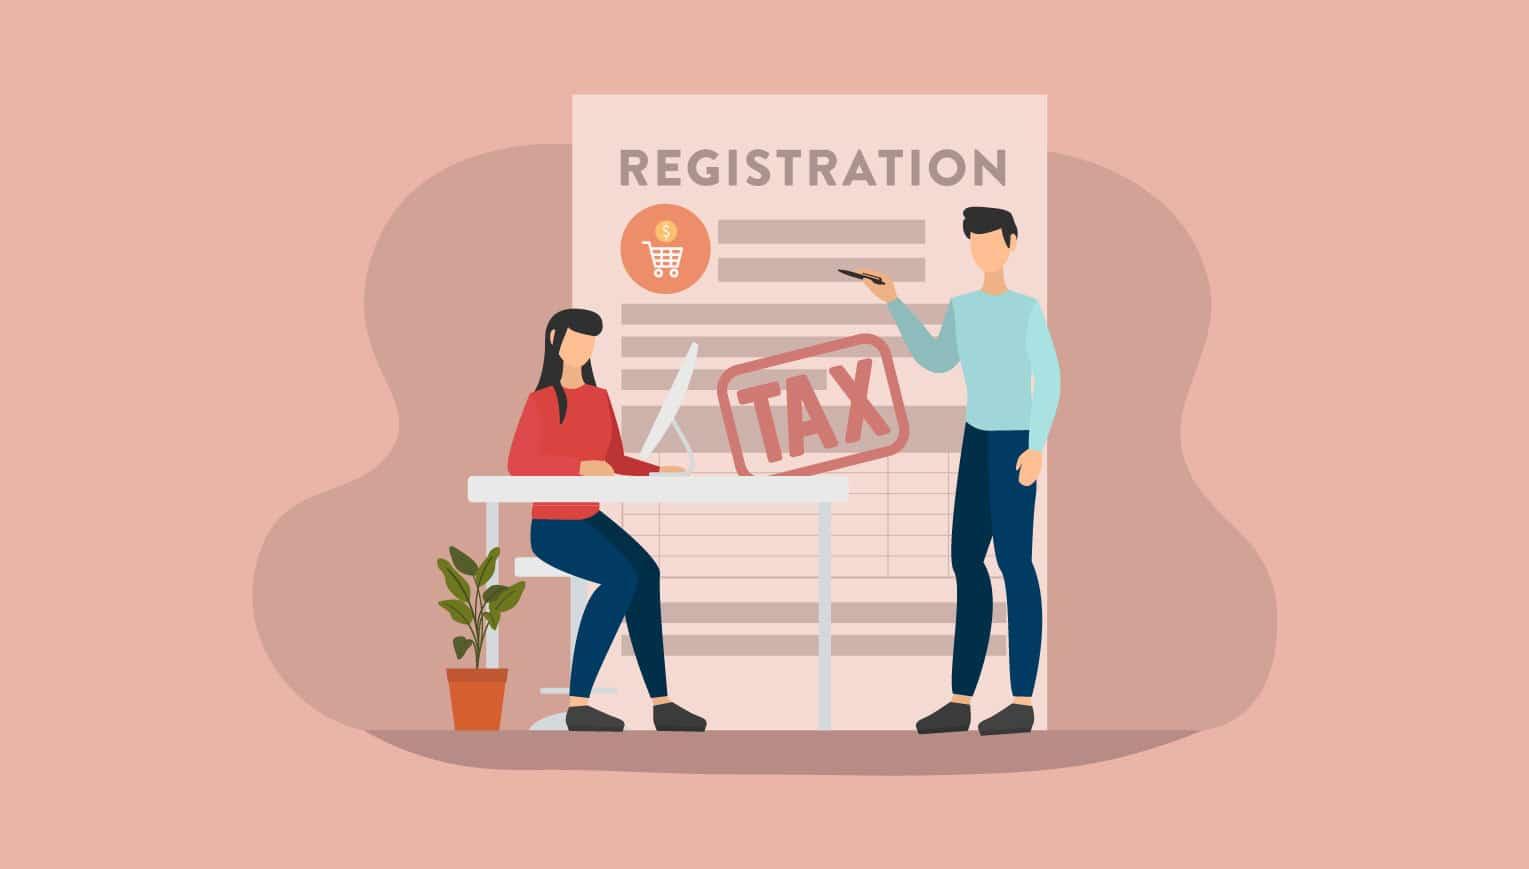 BIR Registration for Online & Digital Businesses in the Philippines